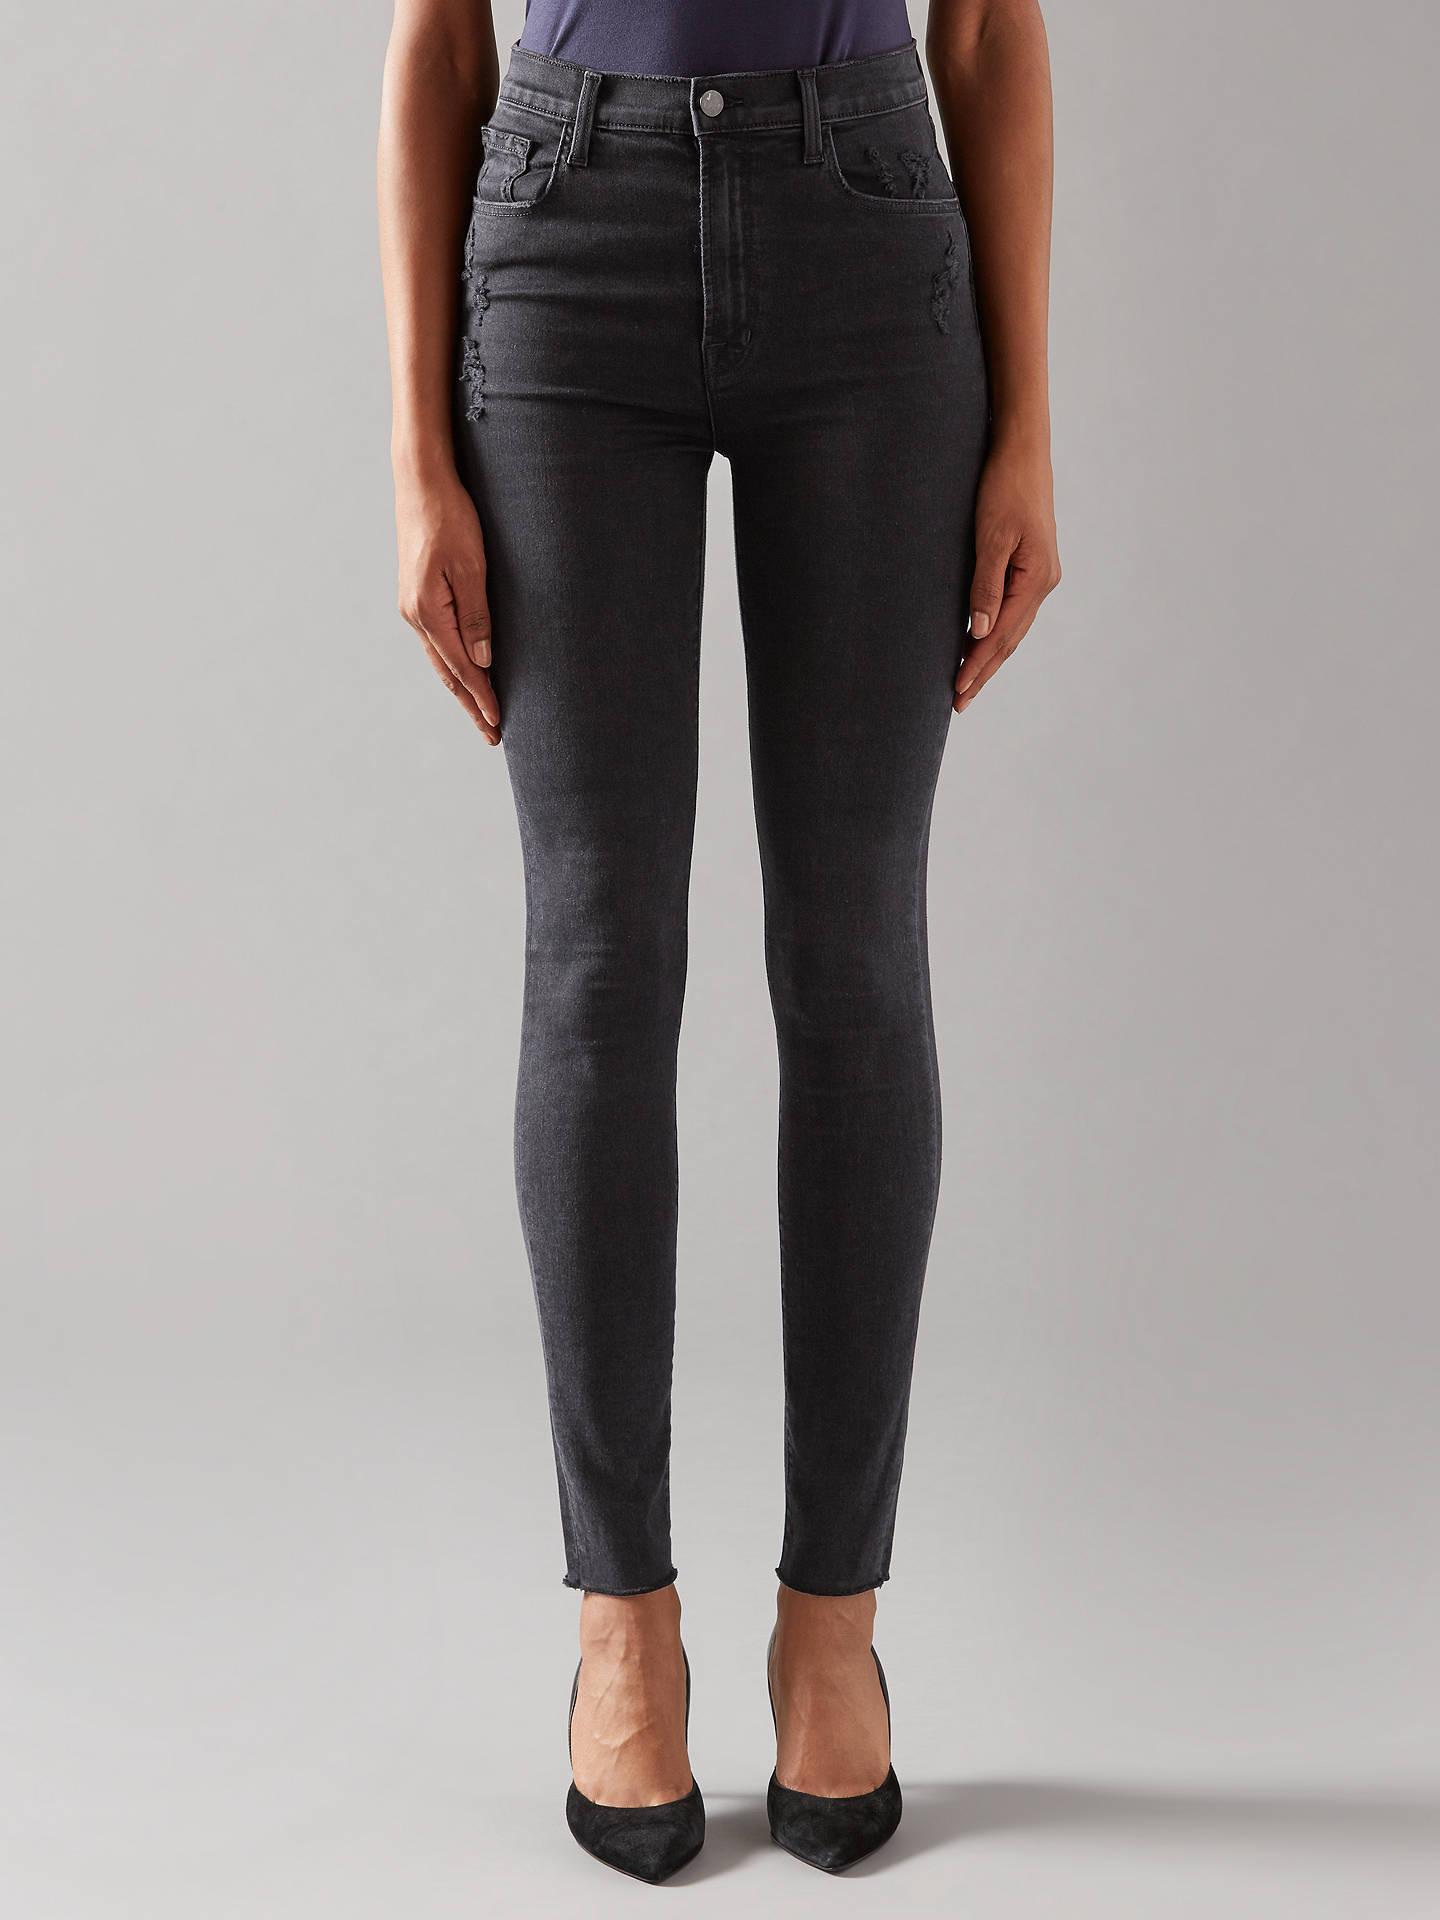 8bb2b3190480 Buy J Brand Carolina High Rise Skinny Jeans